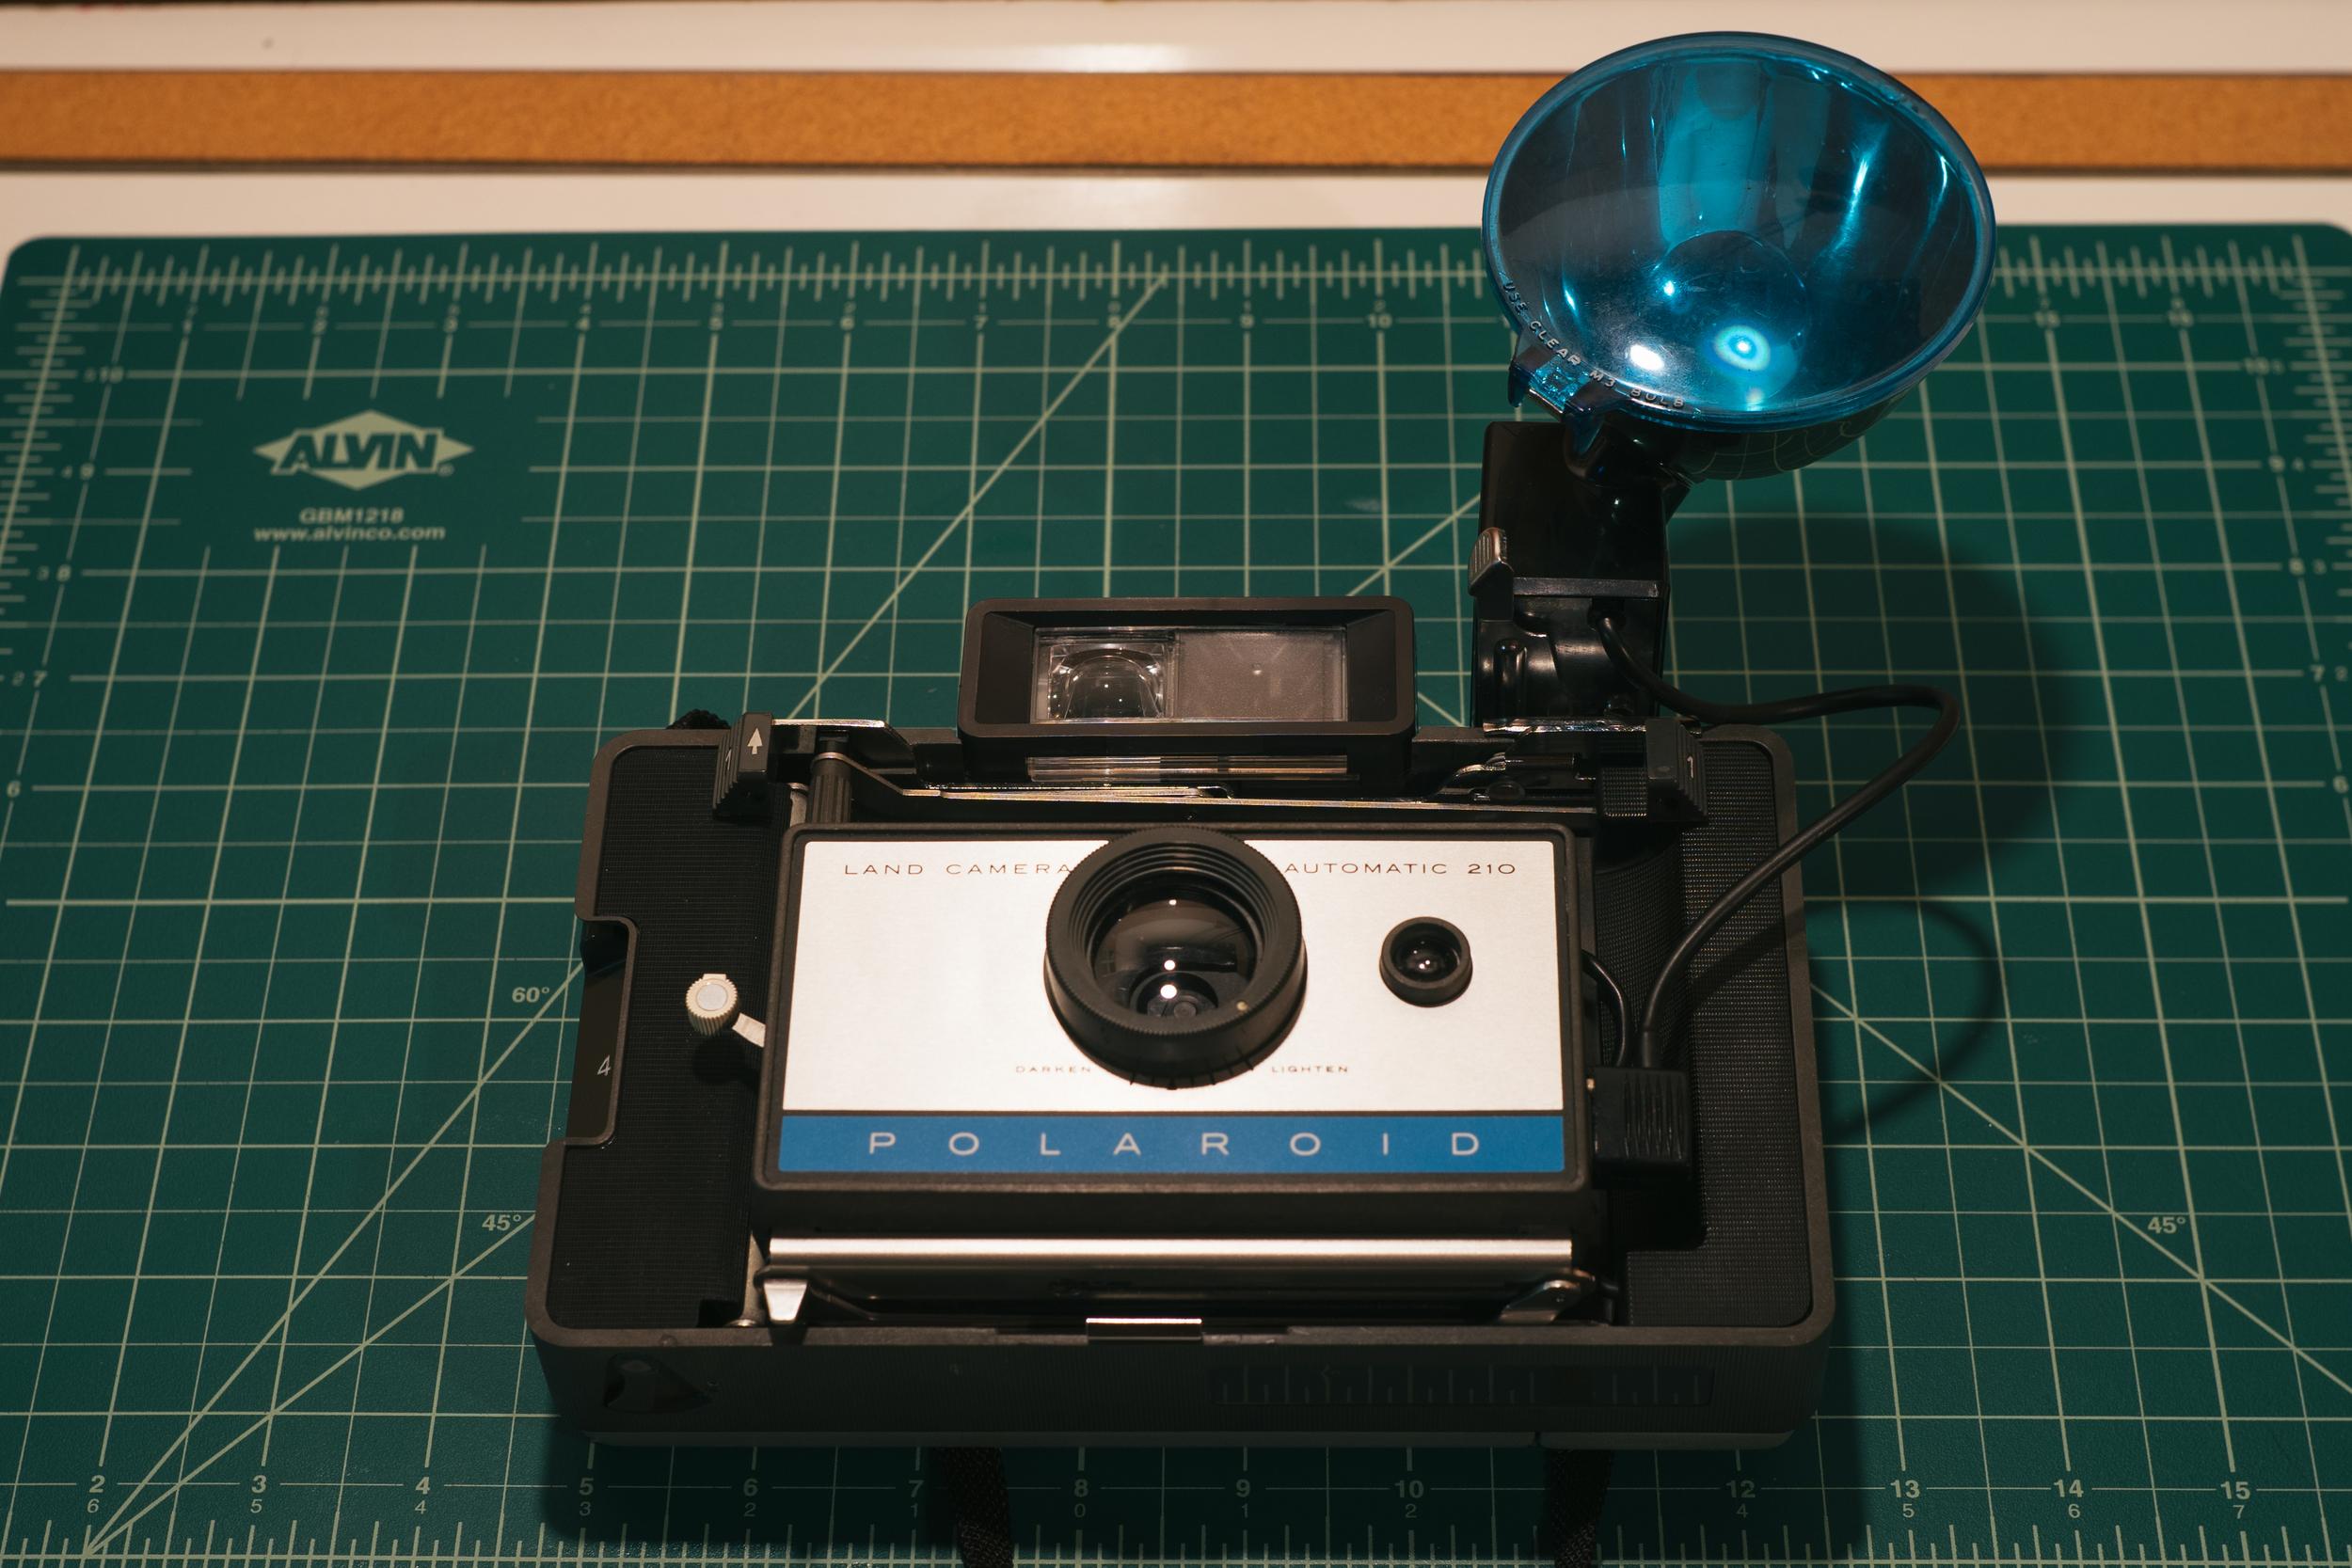 Polaroid Land Camera Automatic 210 with flash